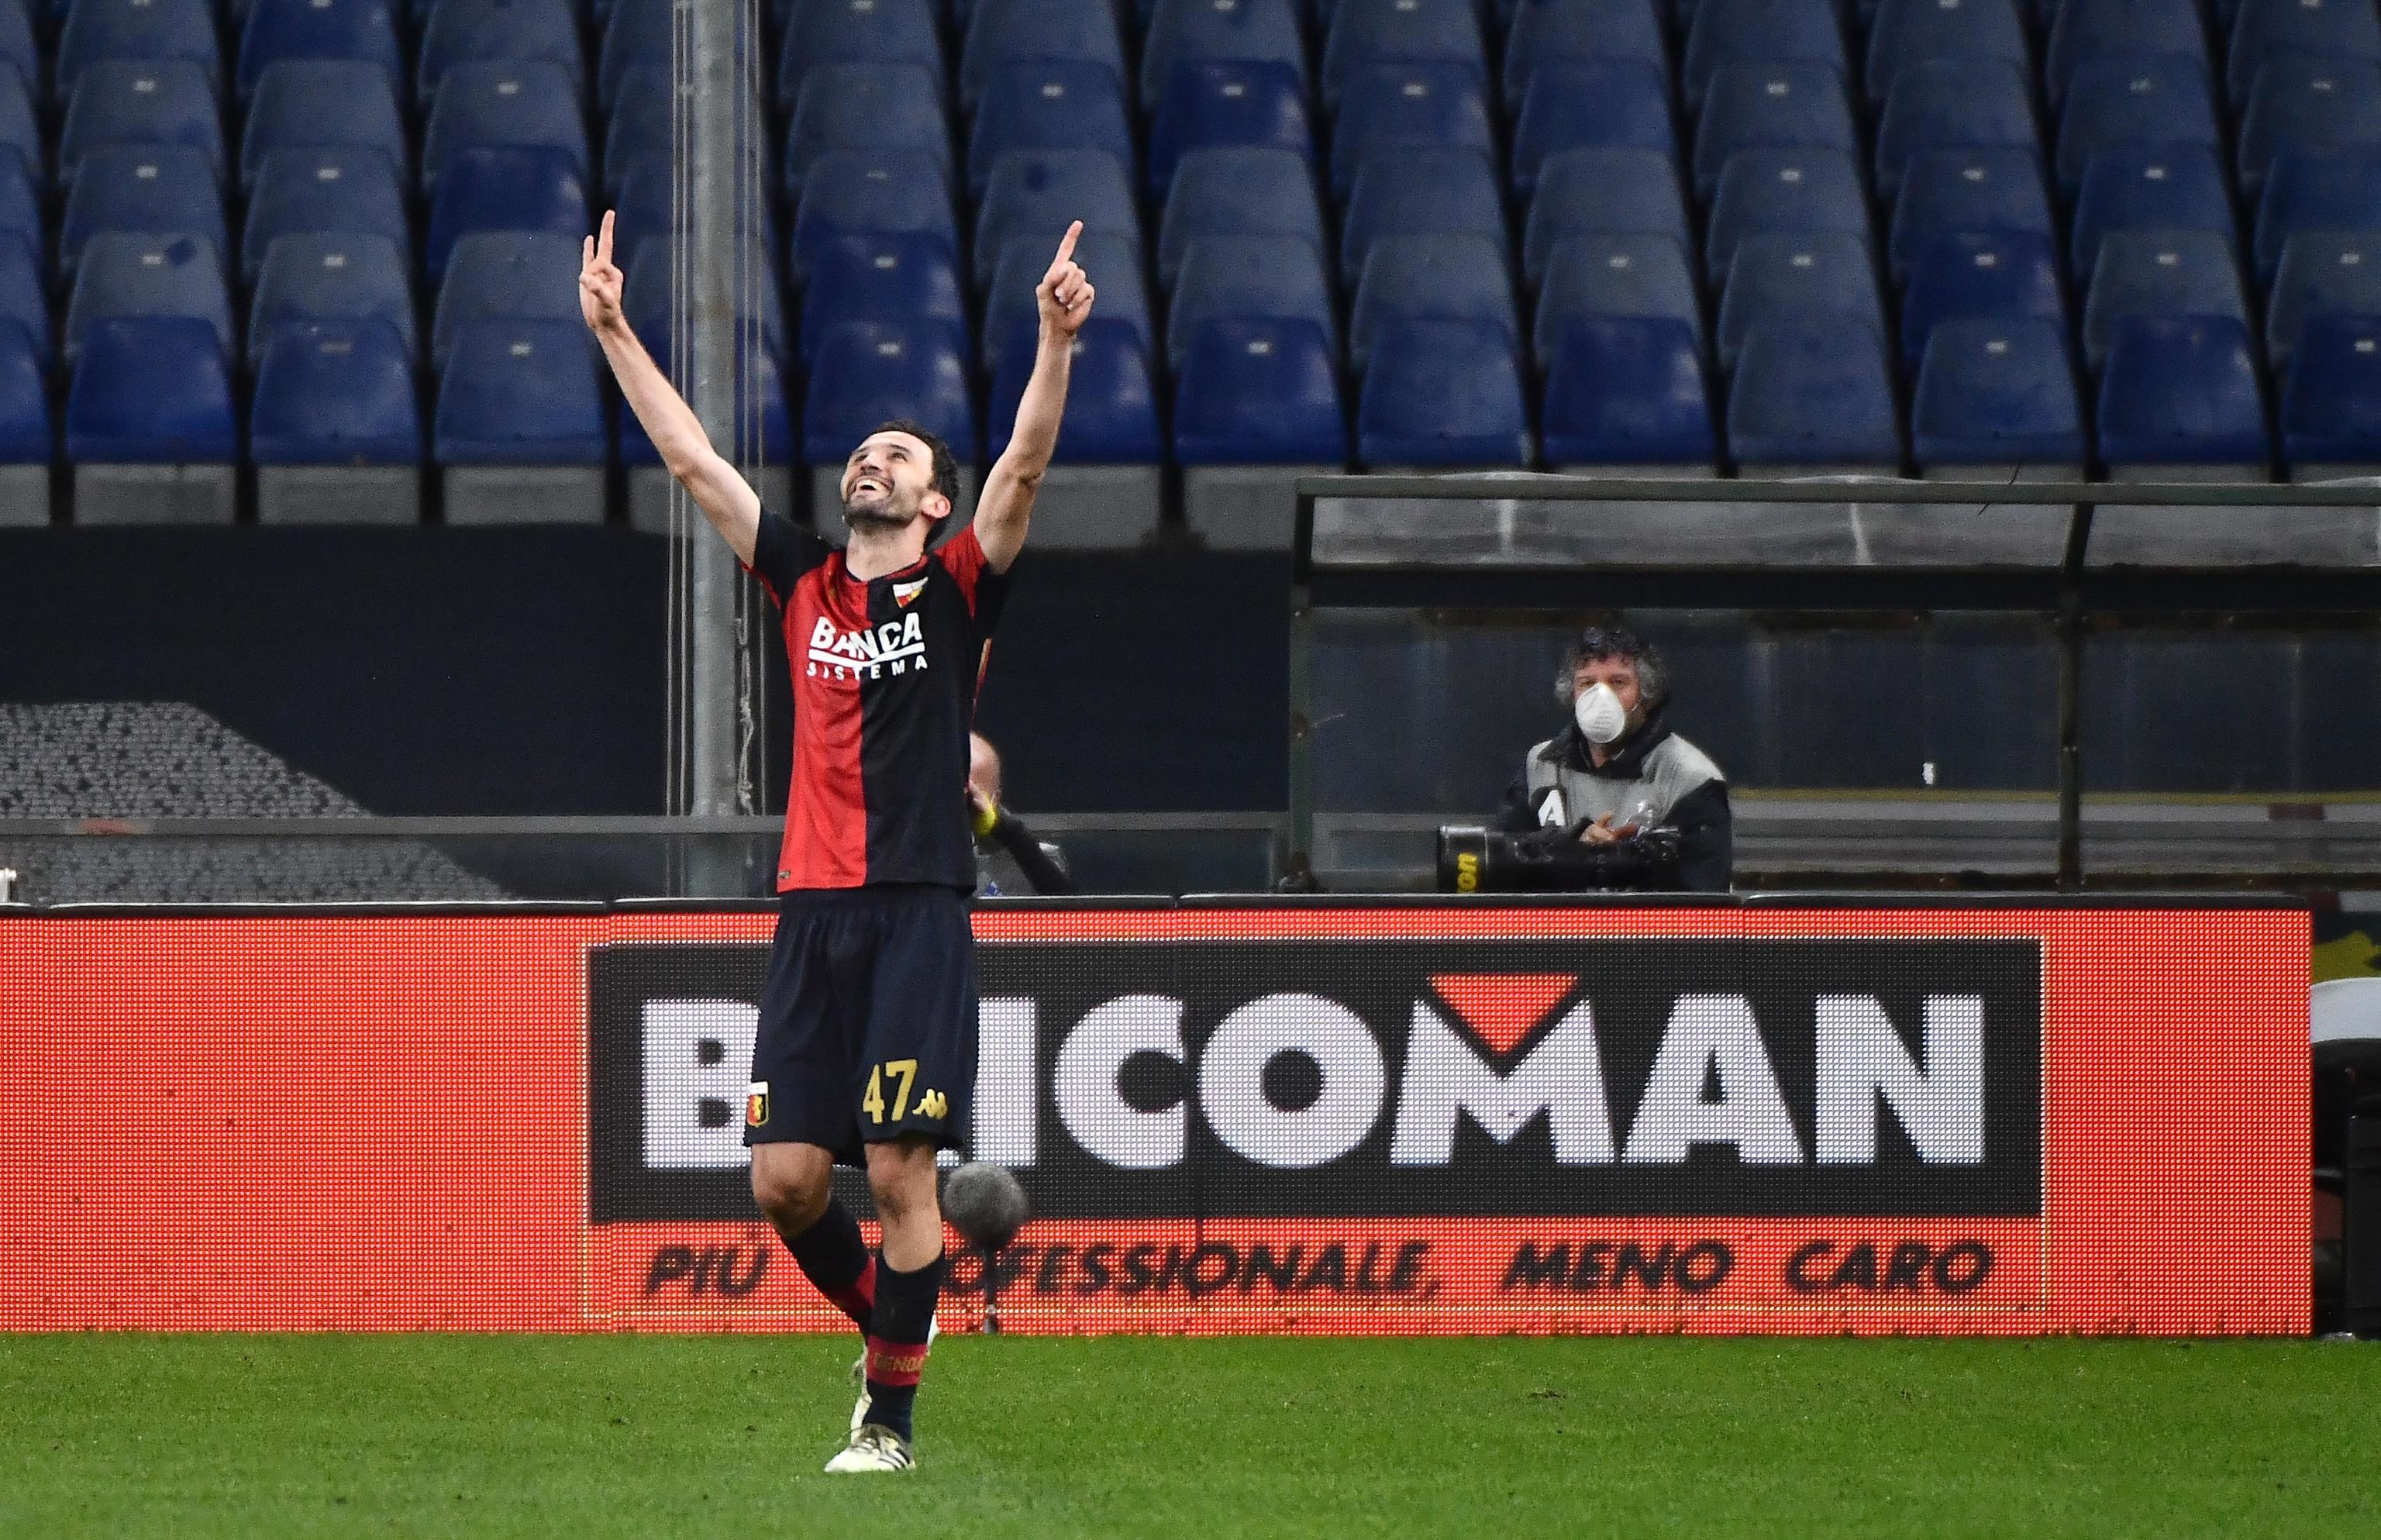 Genoa's Milan Badelj jubilates after scoring the gol during the Italian Serie A match Genoa Cfc vs Hellas Verona Football Club 1903 at Luigi Ferraris stadium in Genoa, Italy, 20 February 2021.ANSA/LUCA ZENNARO